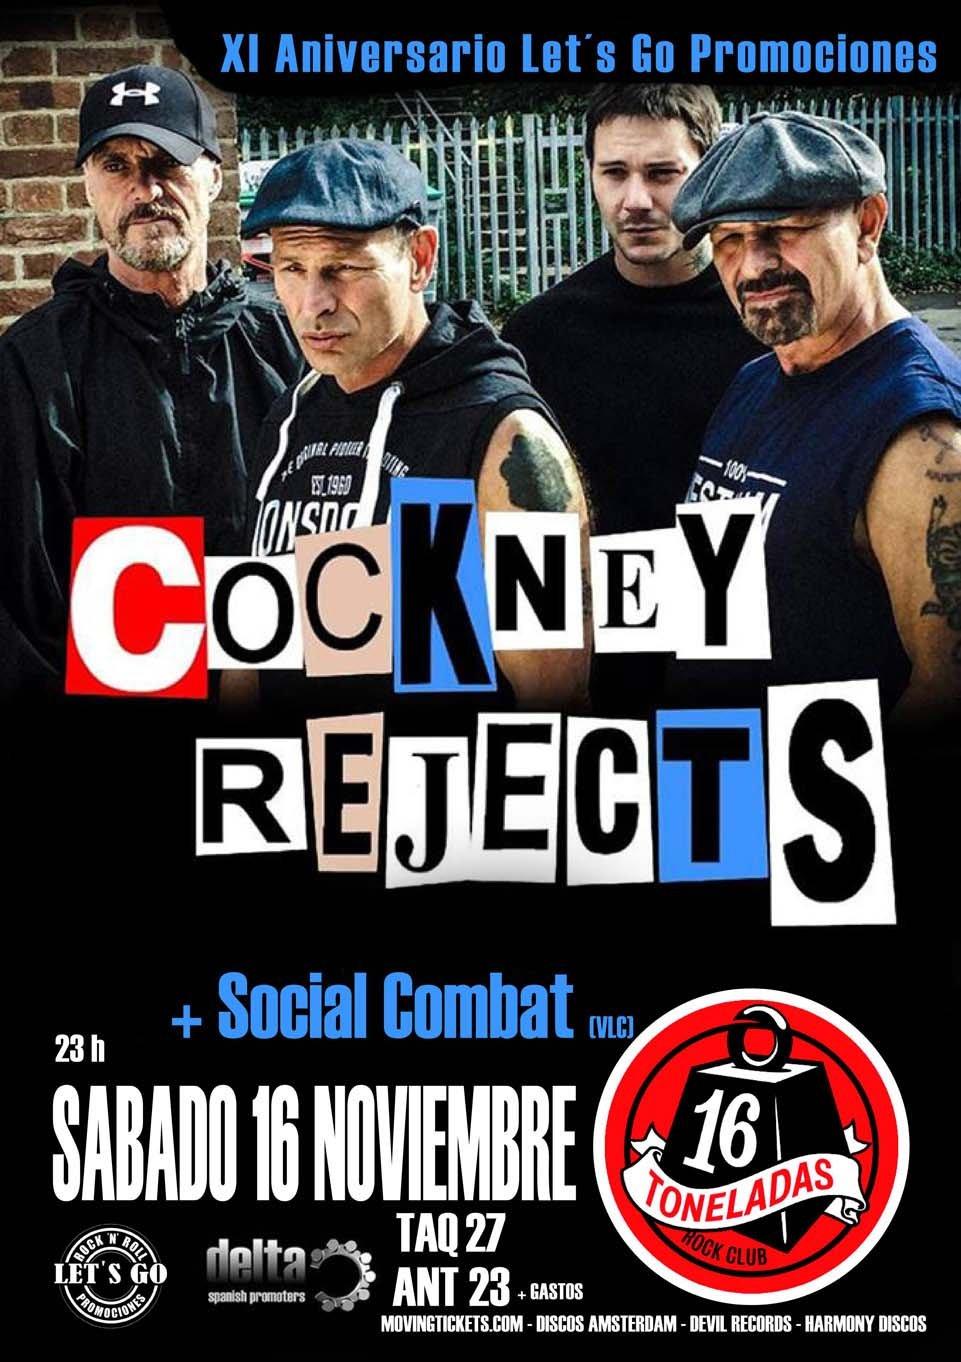 16-s-cockney-rejectssocial-combat2